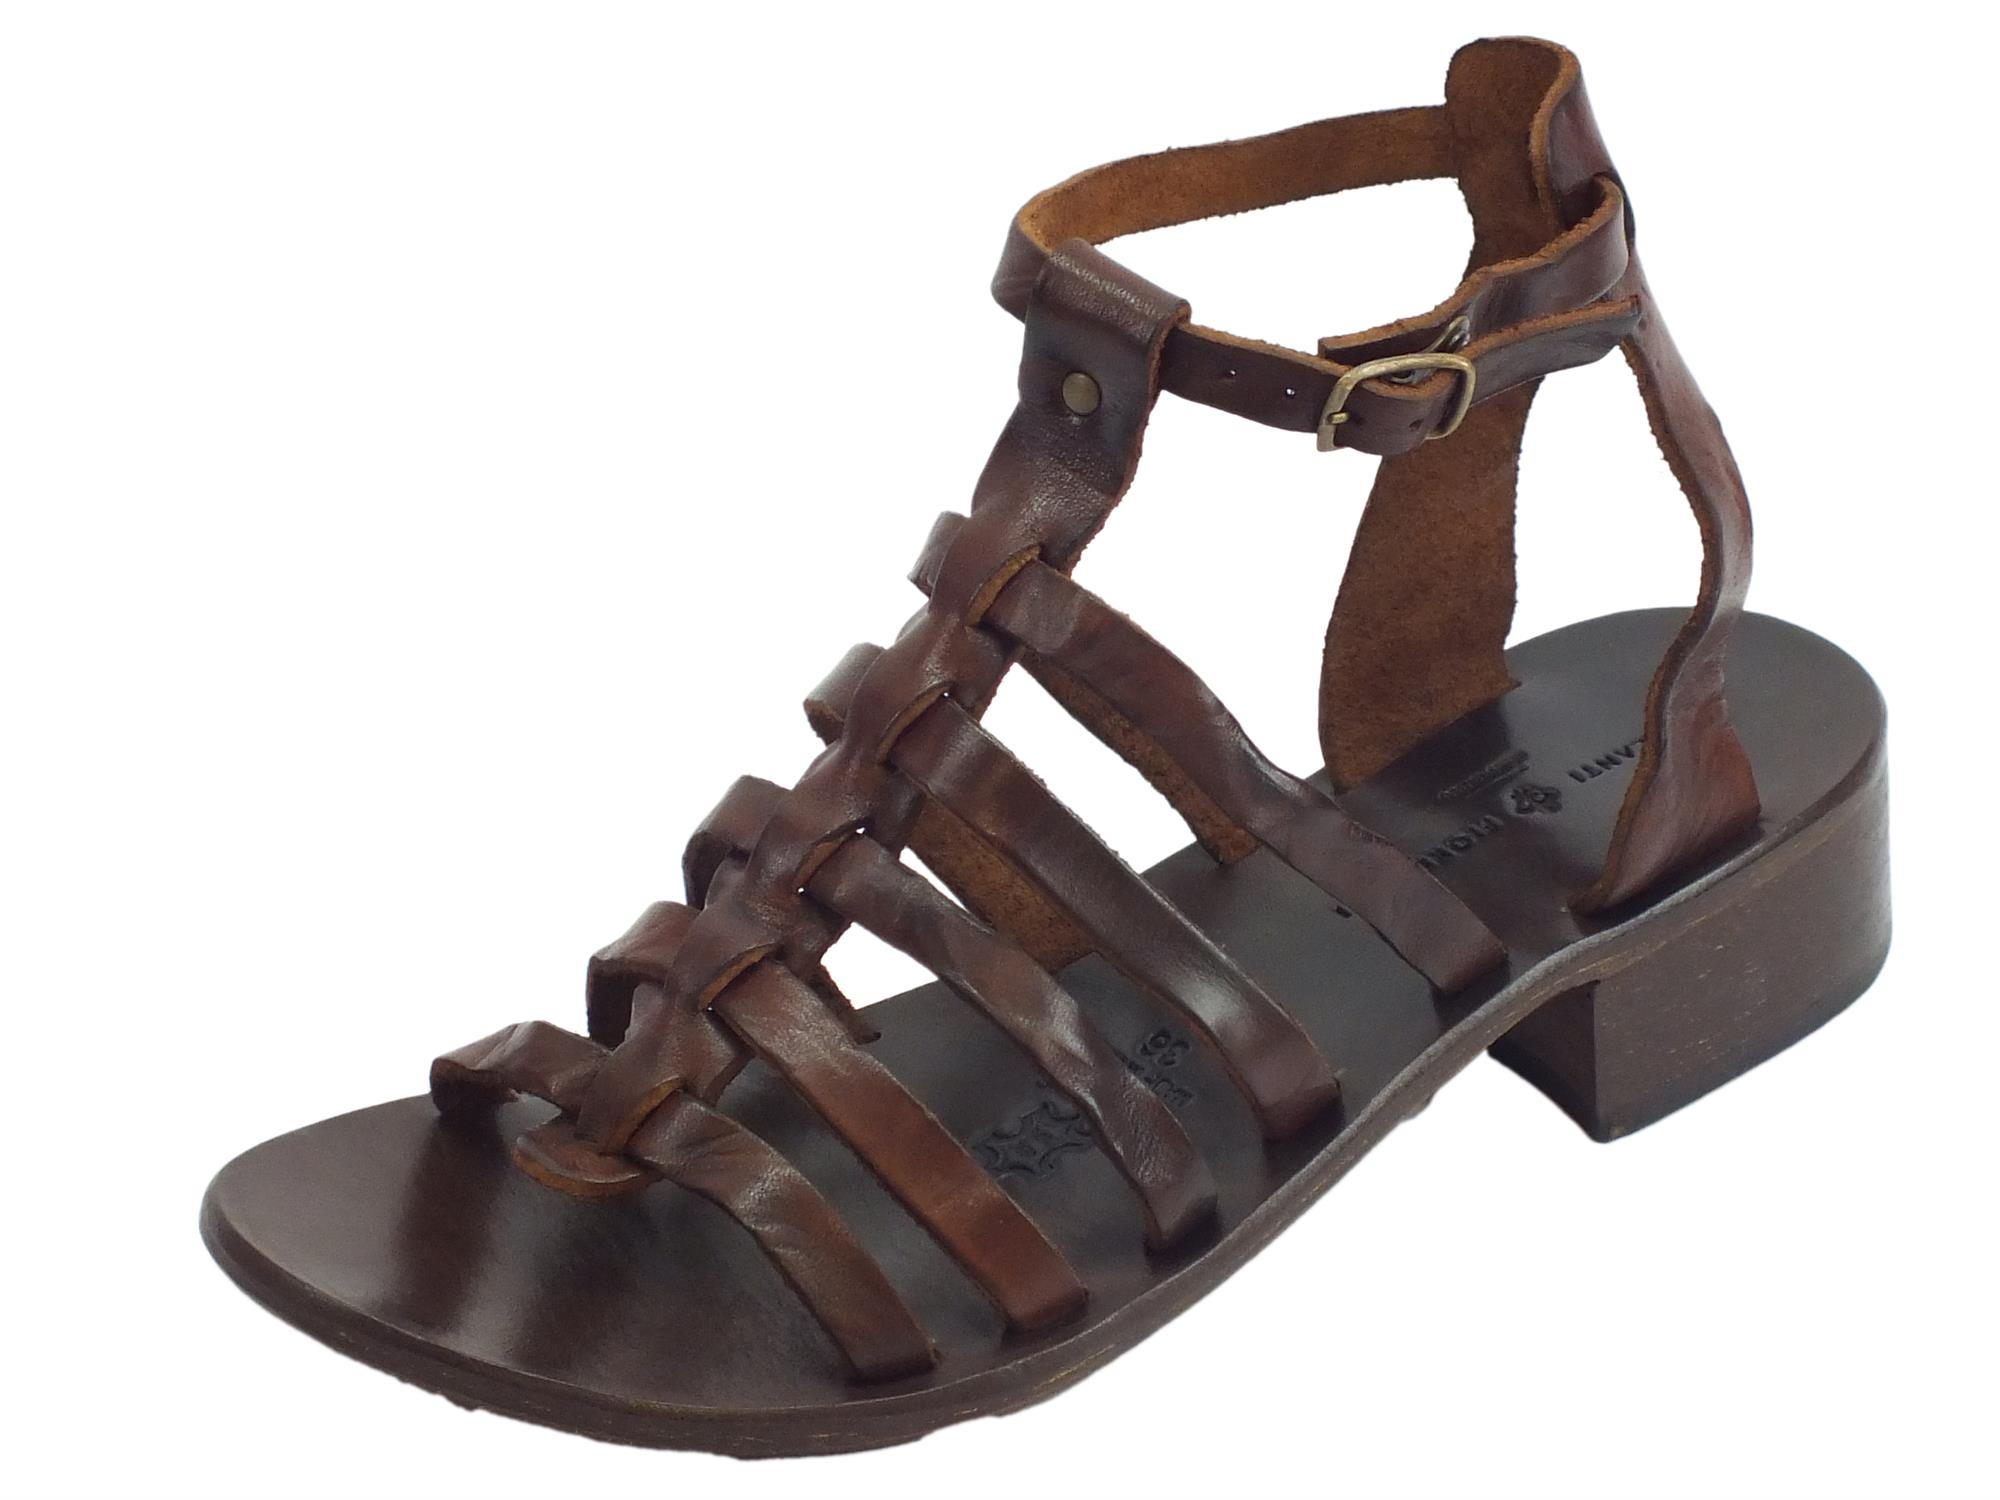 Sandalo Sandalo Sandalo artigianali donna Mercanti Fiorentini pelle tuffata   247f77